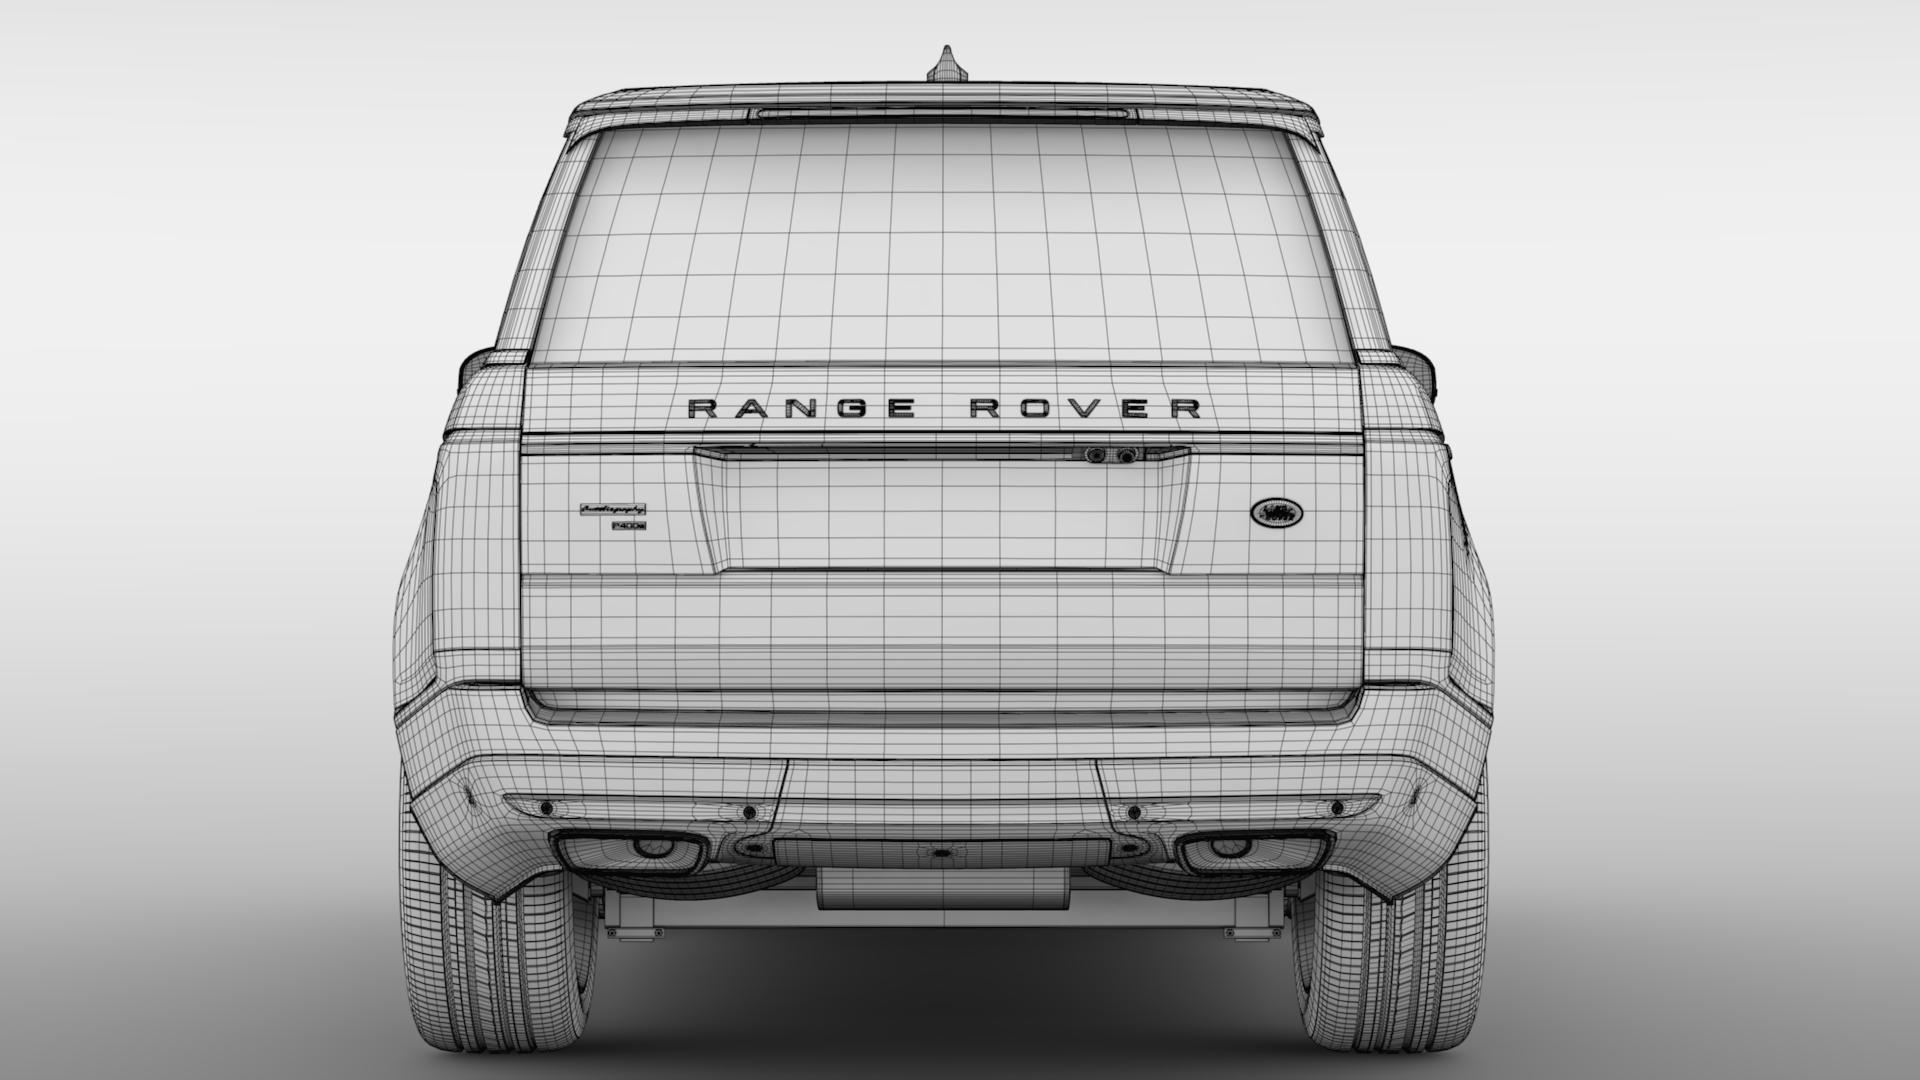 range rover autobiography p400e lwb l405 2018 3d model fbx c4d lwo ma mb hrc xsi obj 277367